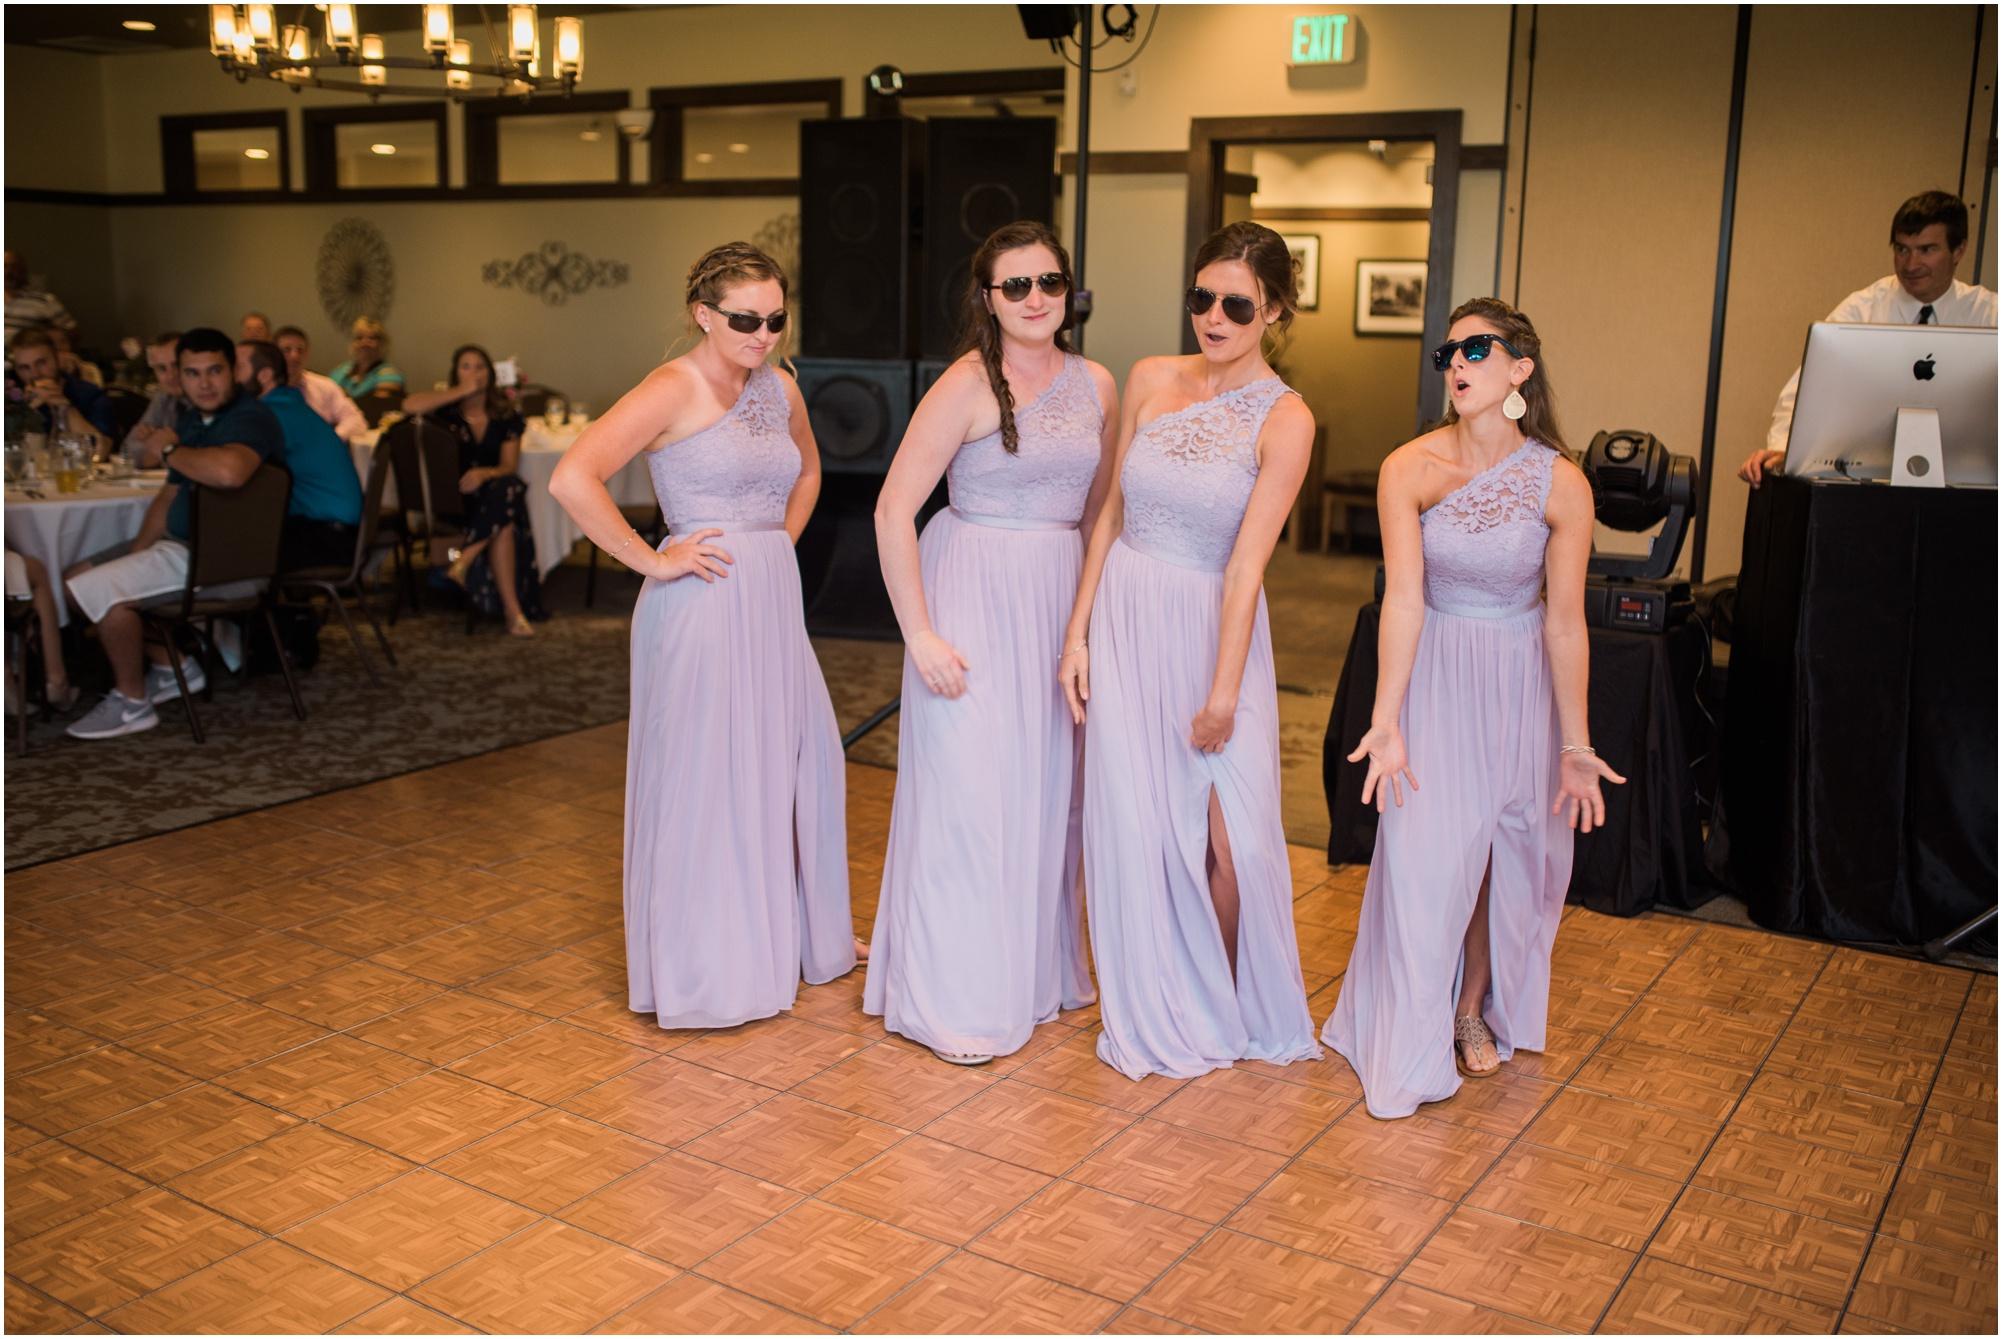 Wisconsin-Wedding-Photographer-Reedsburg-Country-Club-Kaela-and Matt-Wedding-794.jpg